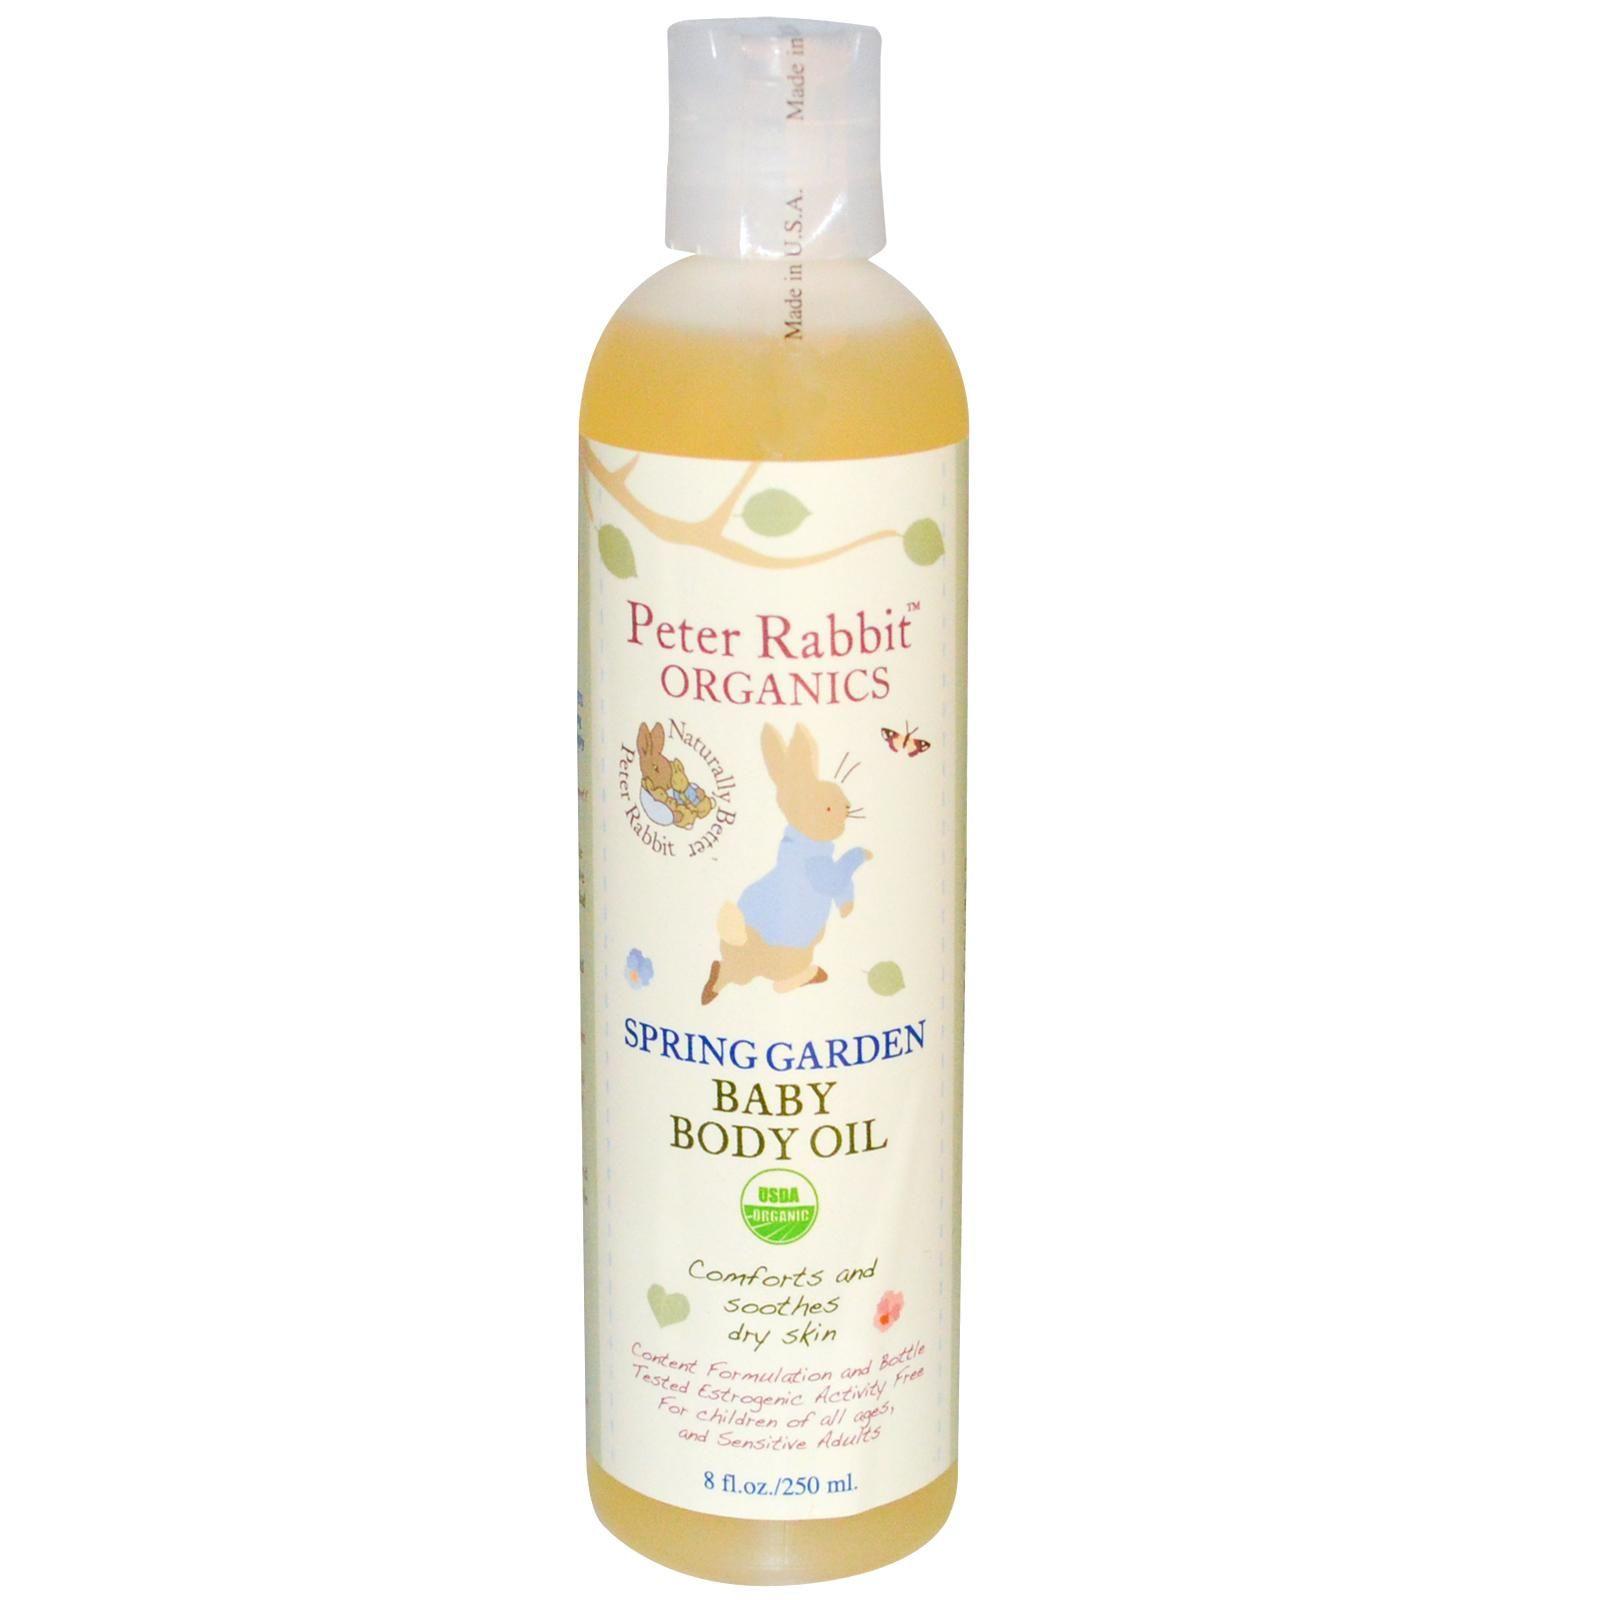 Peter Rabbit Baby Body Oil Daughter Peter Rabbit Organics